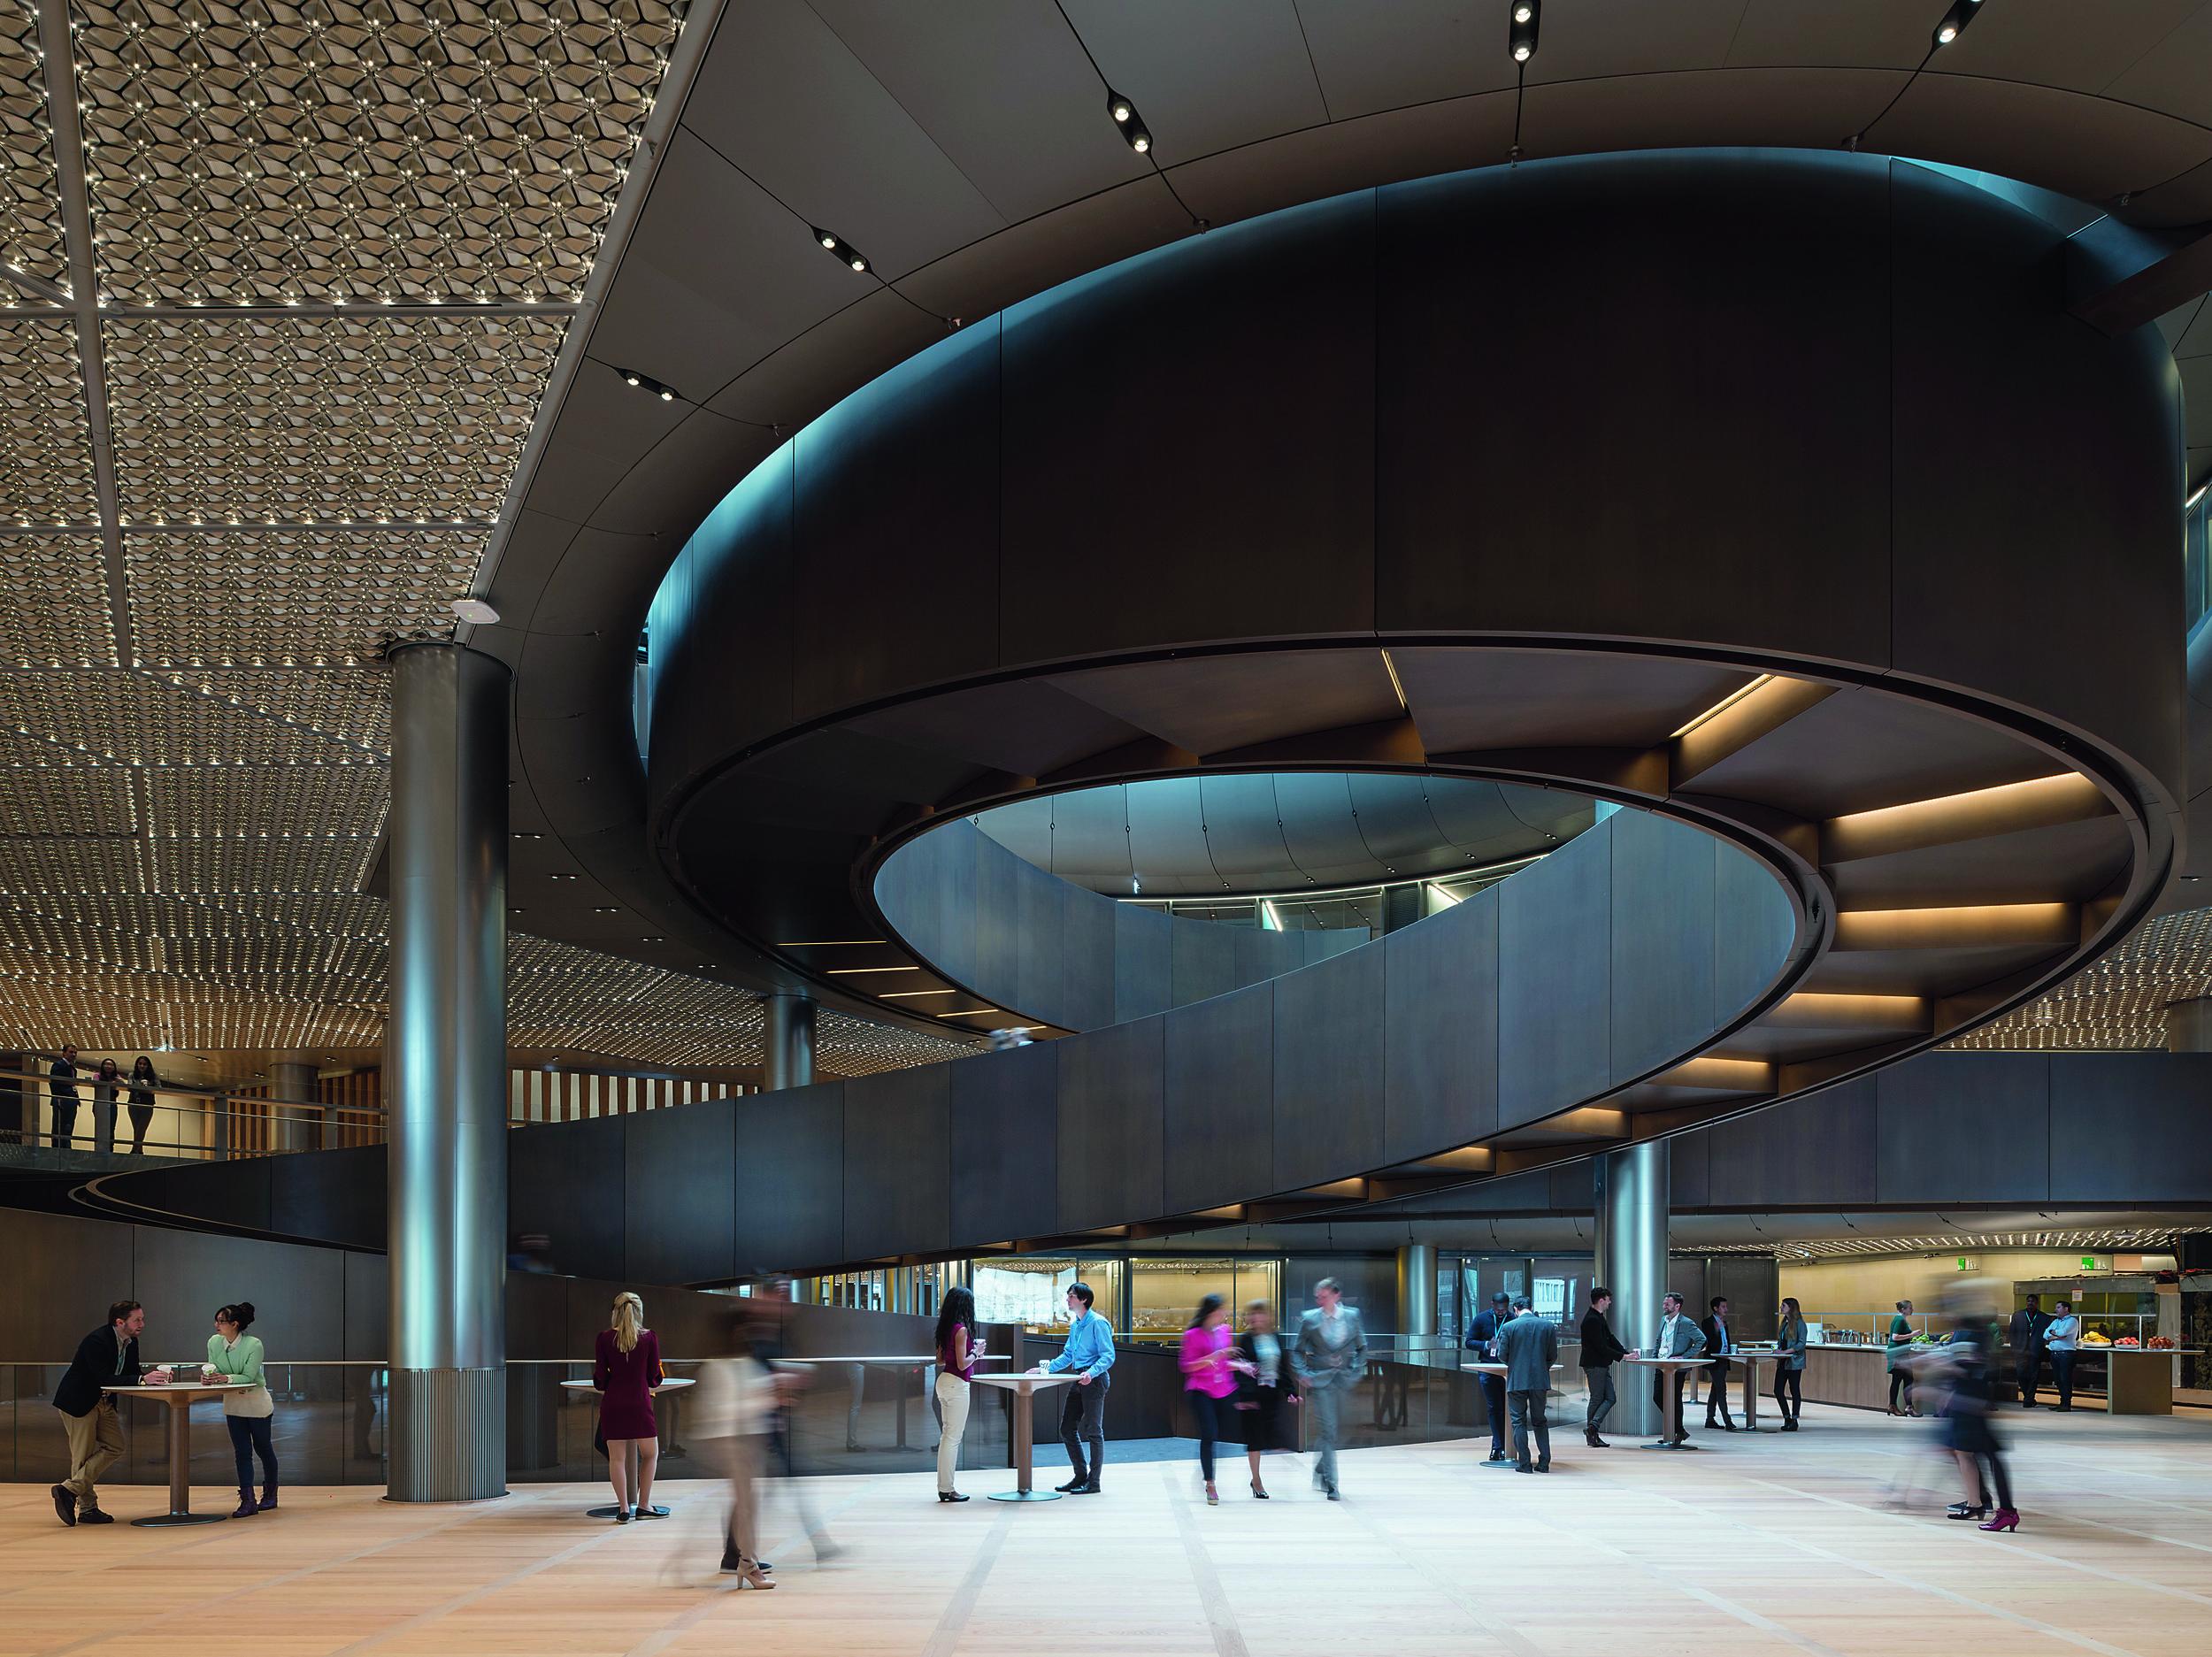 Bloomberg_LDN_Interior_09_Pantry.jpg